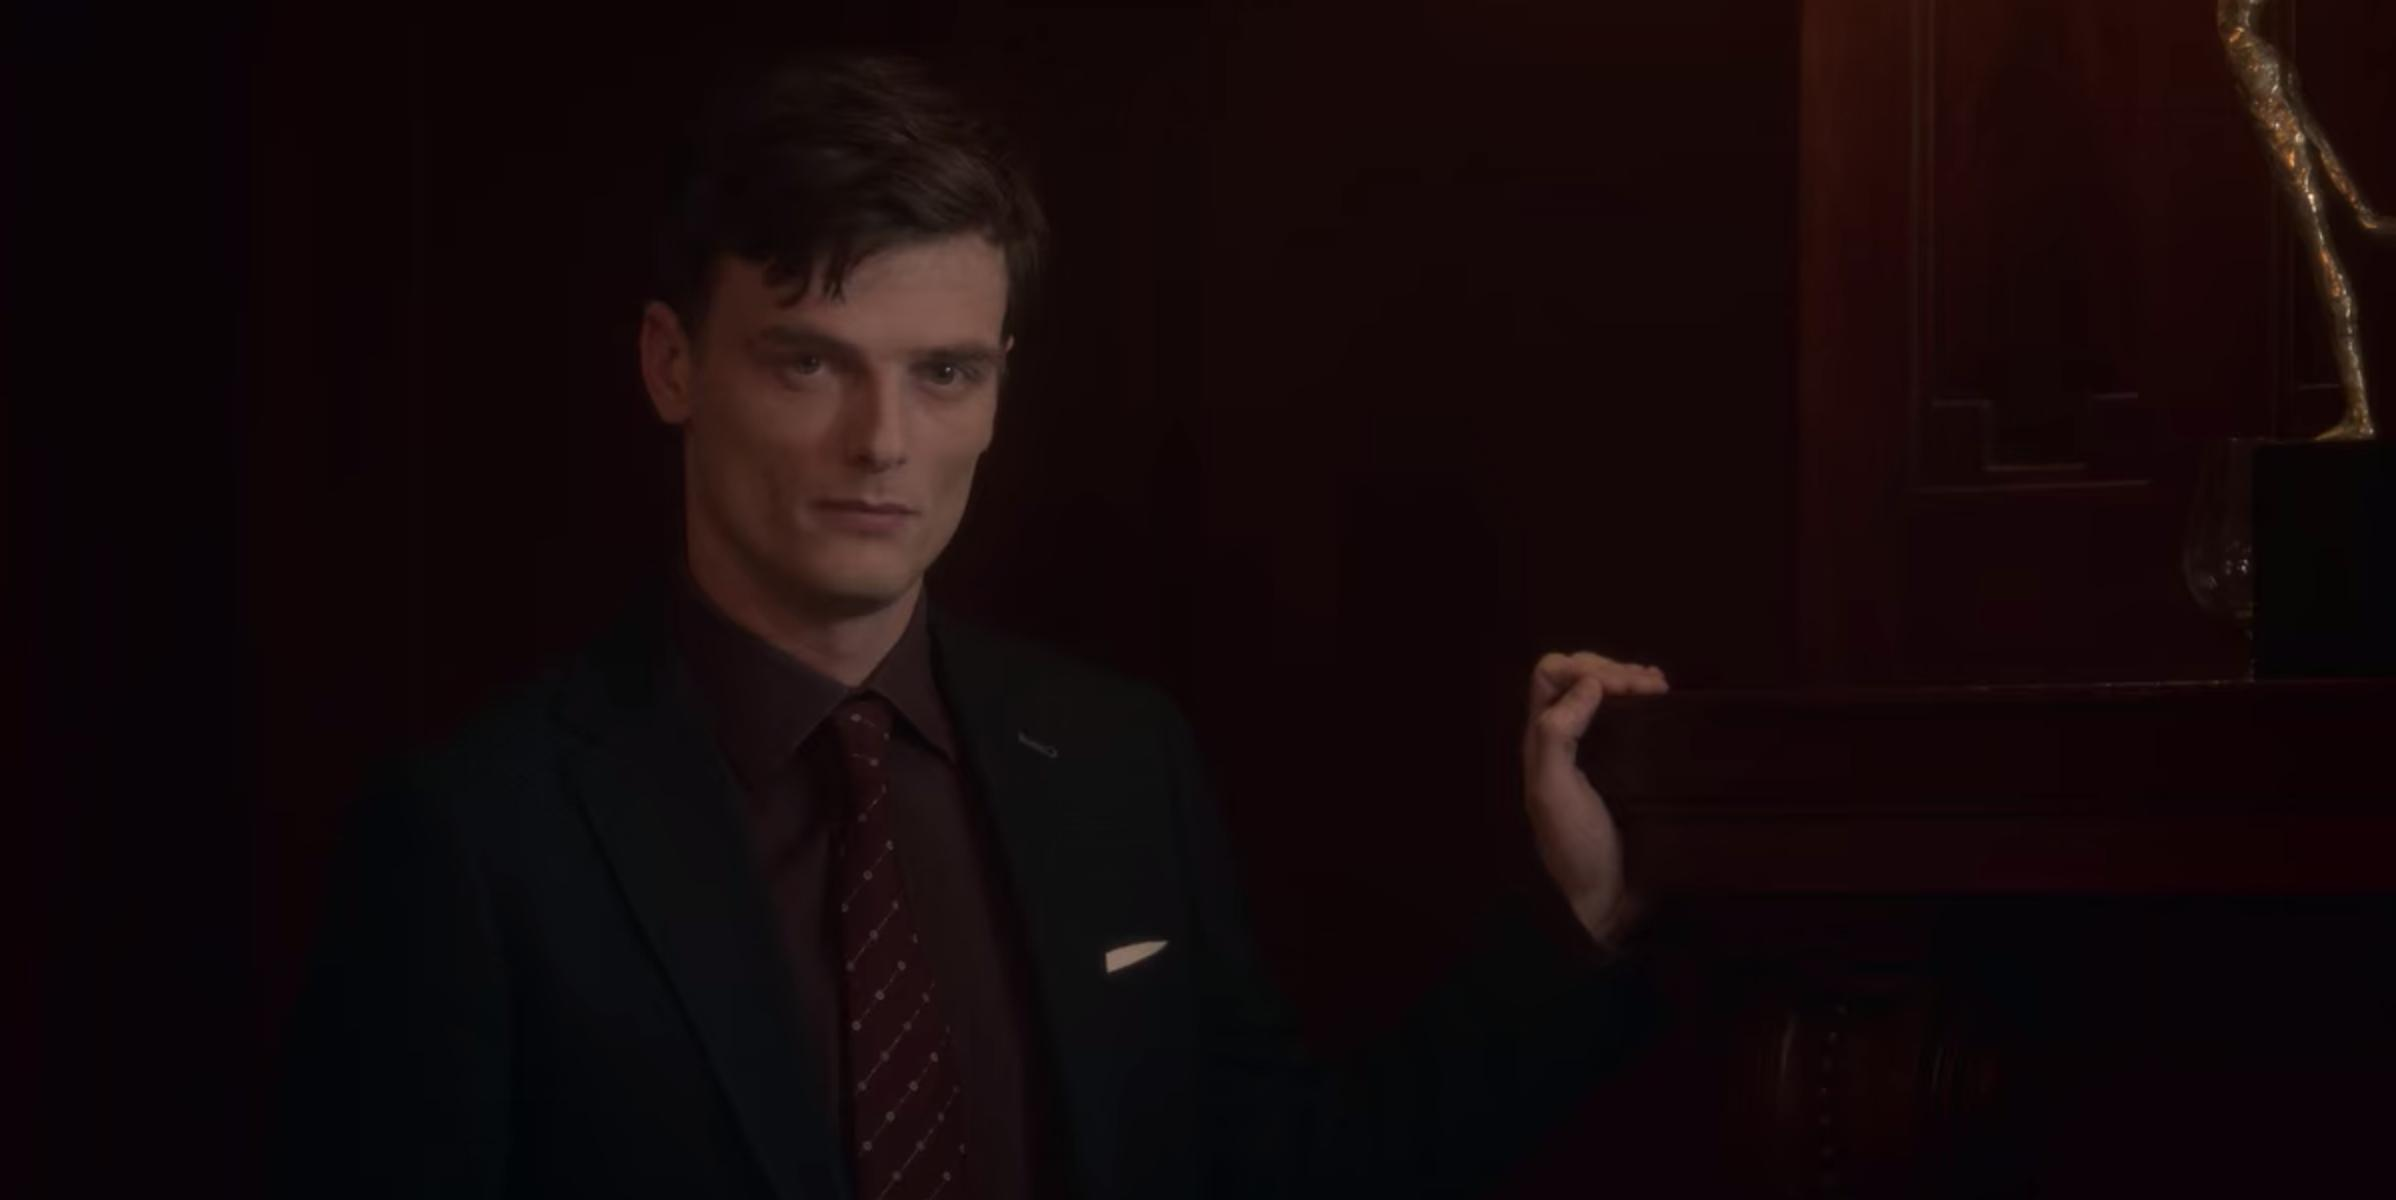 The Spy Who Sexed Me